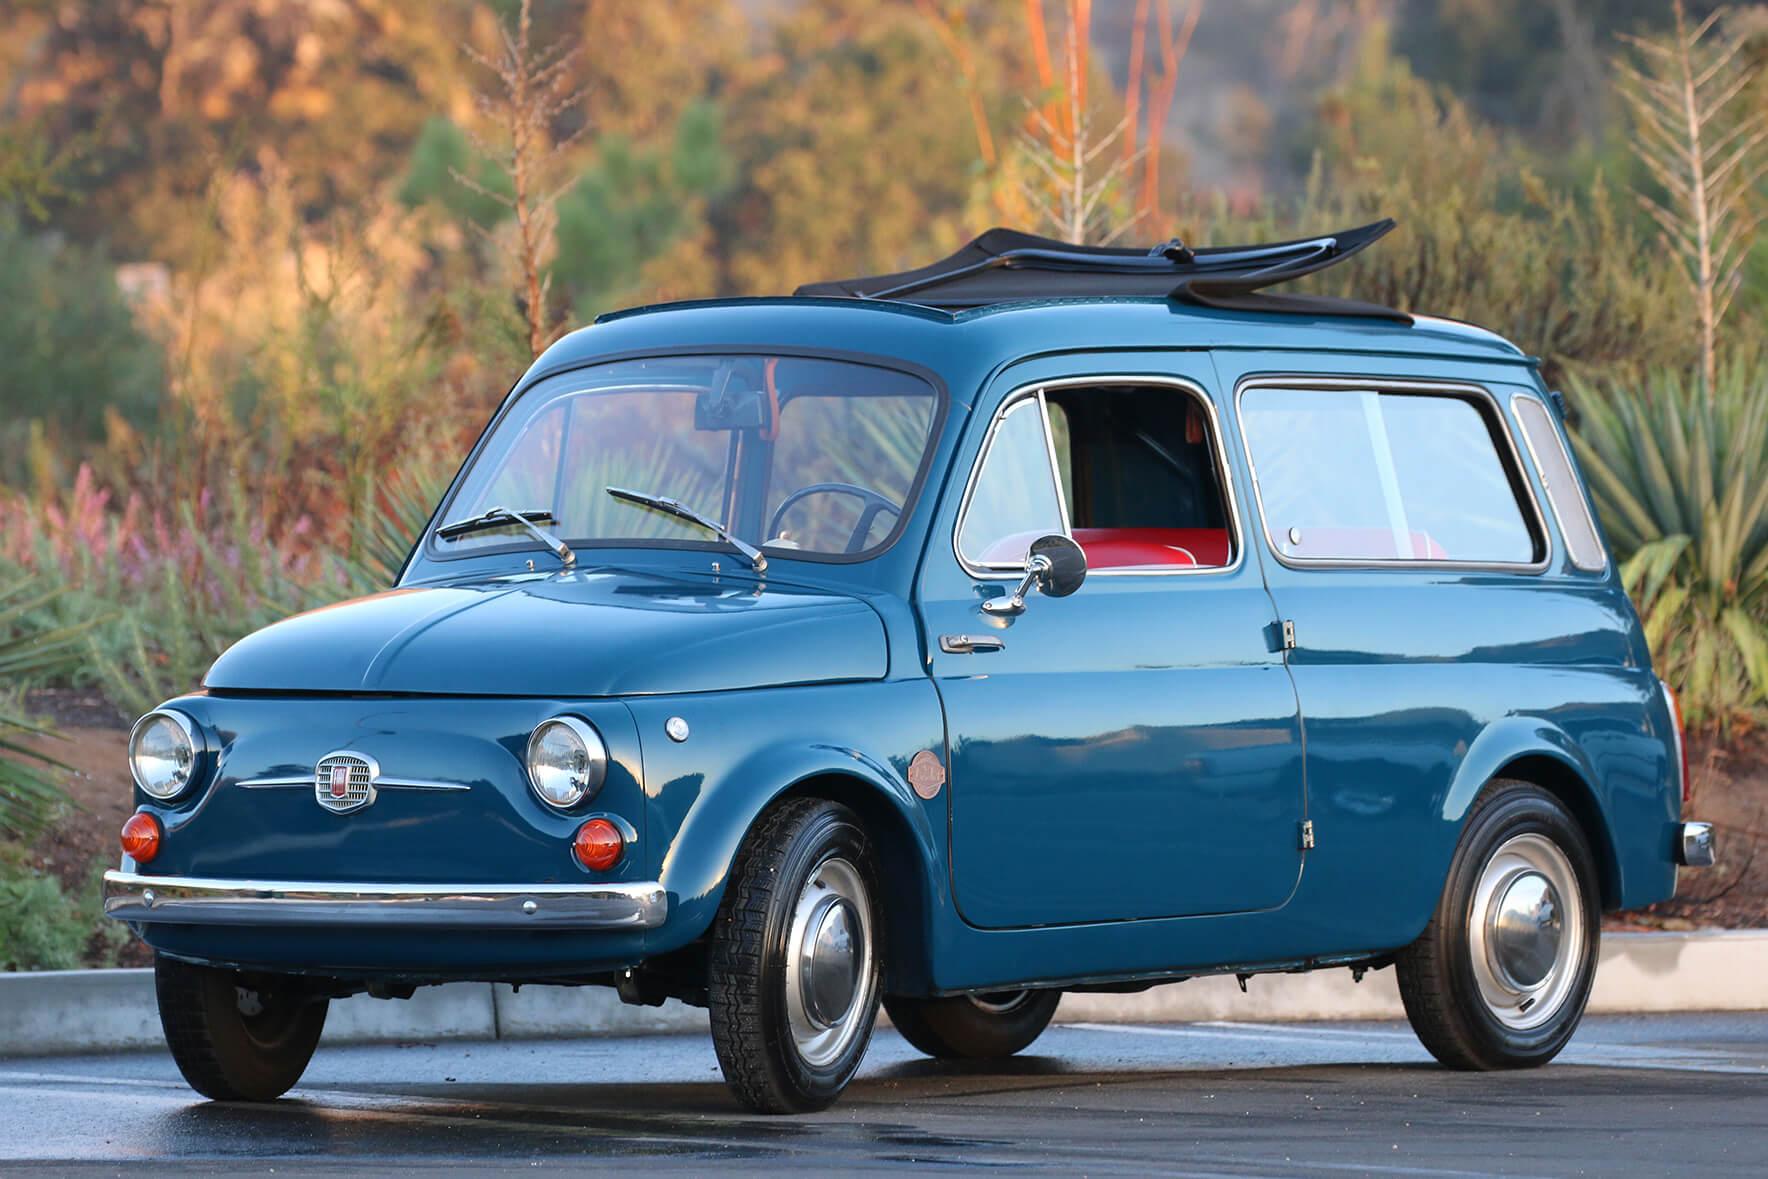 1966 Fiat Giardiniera EV